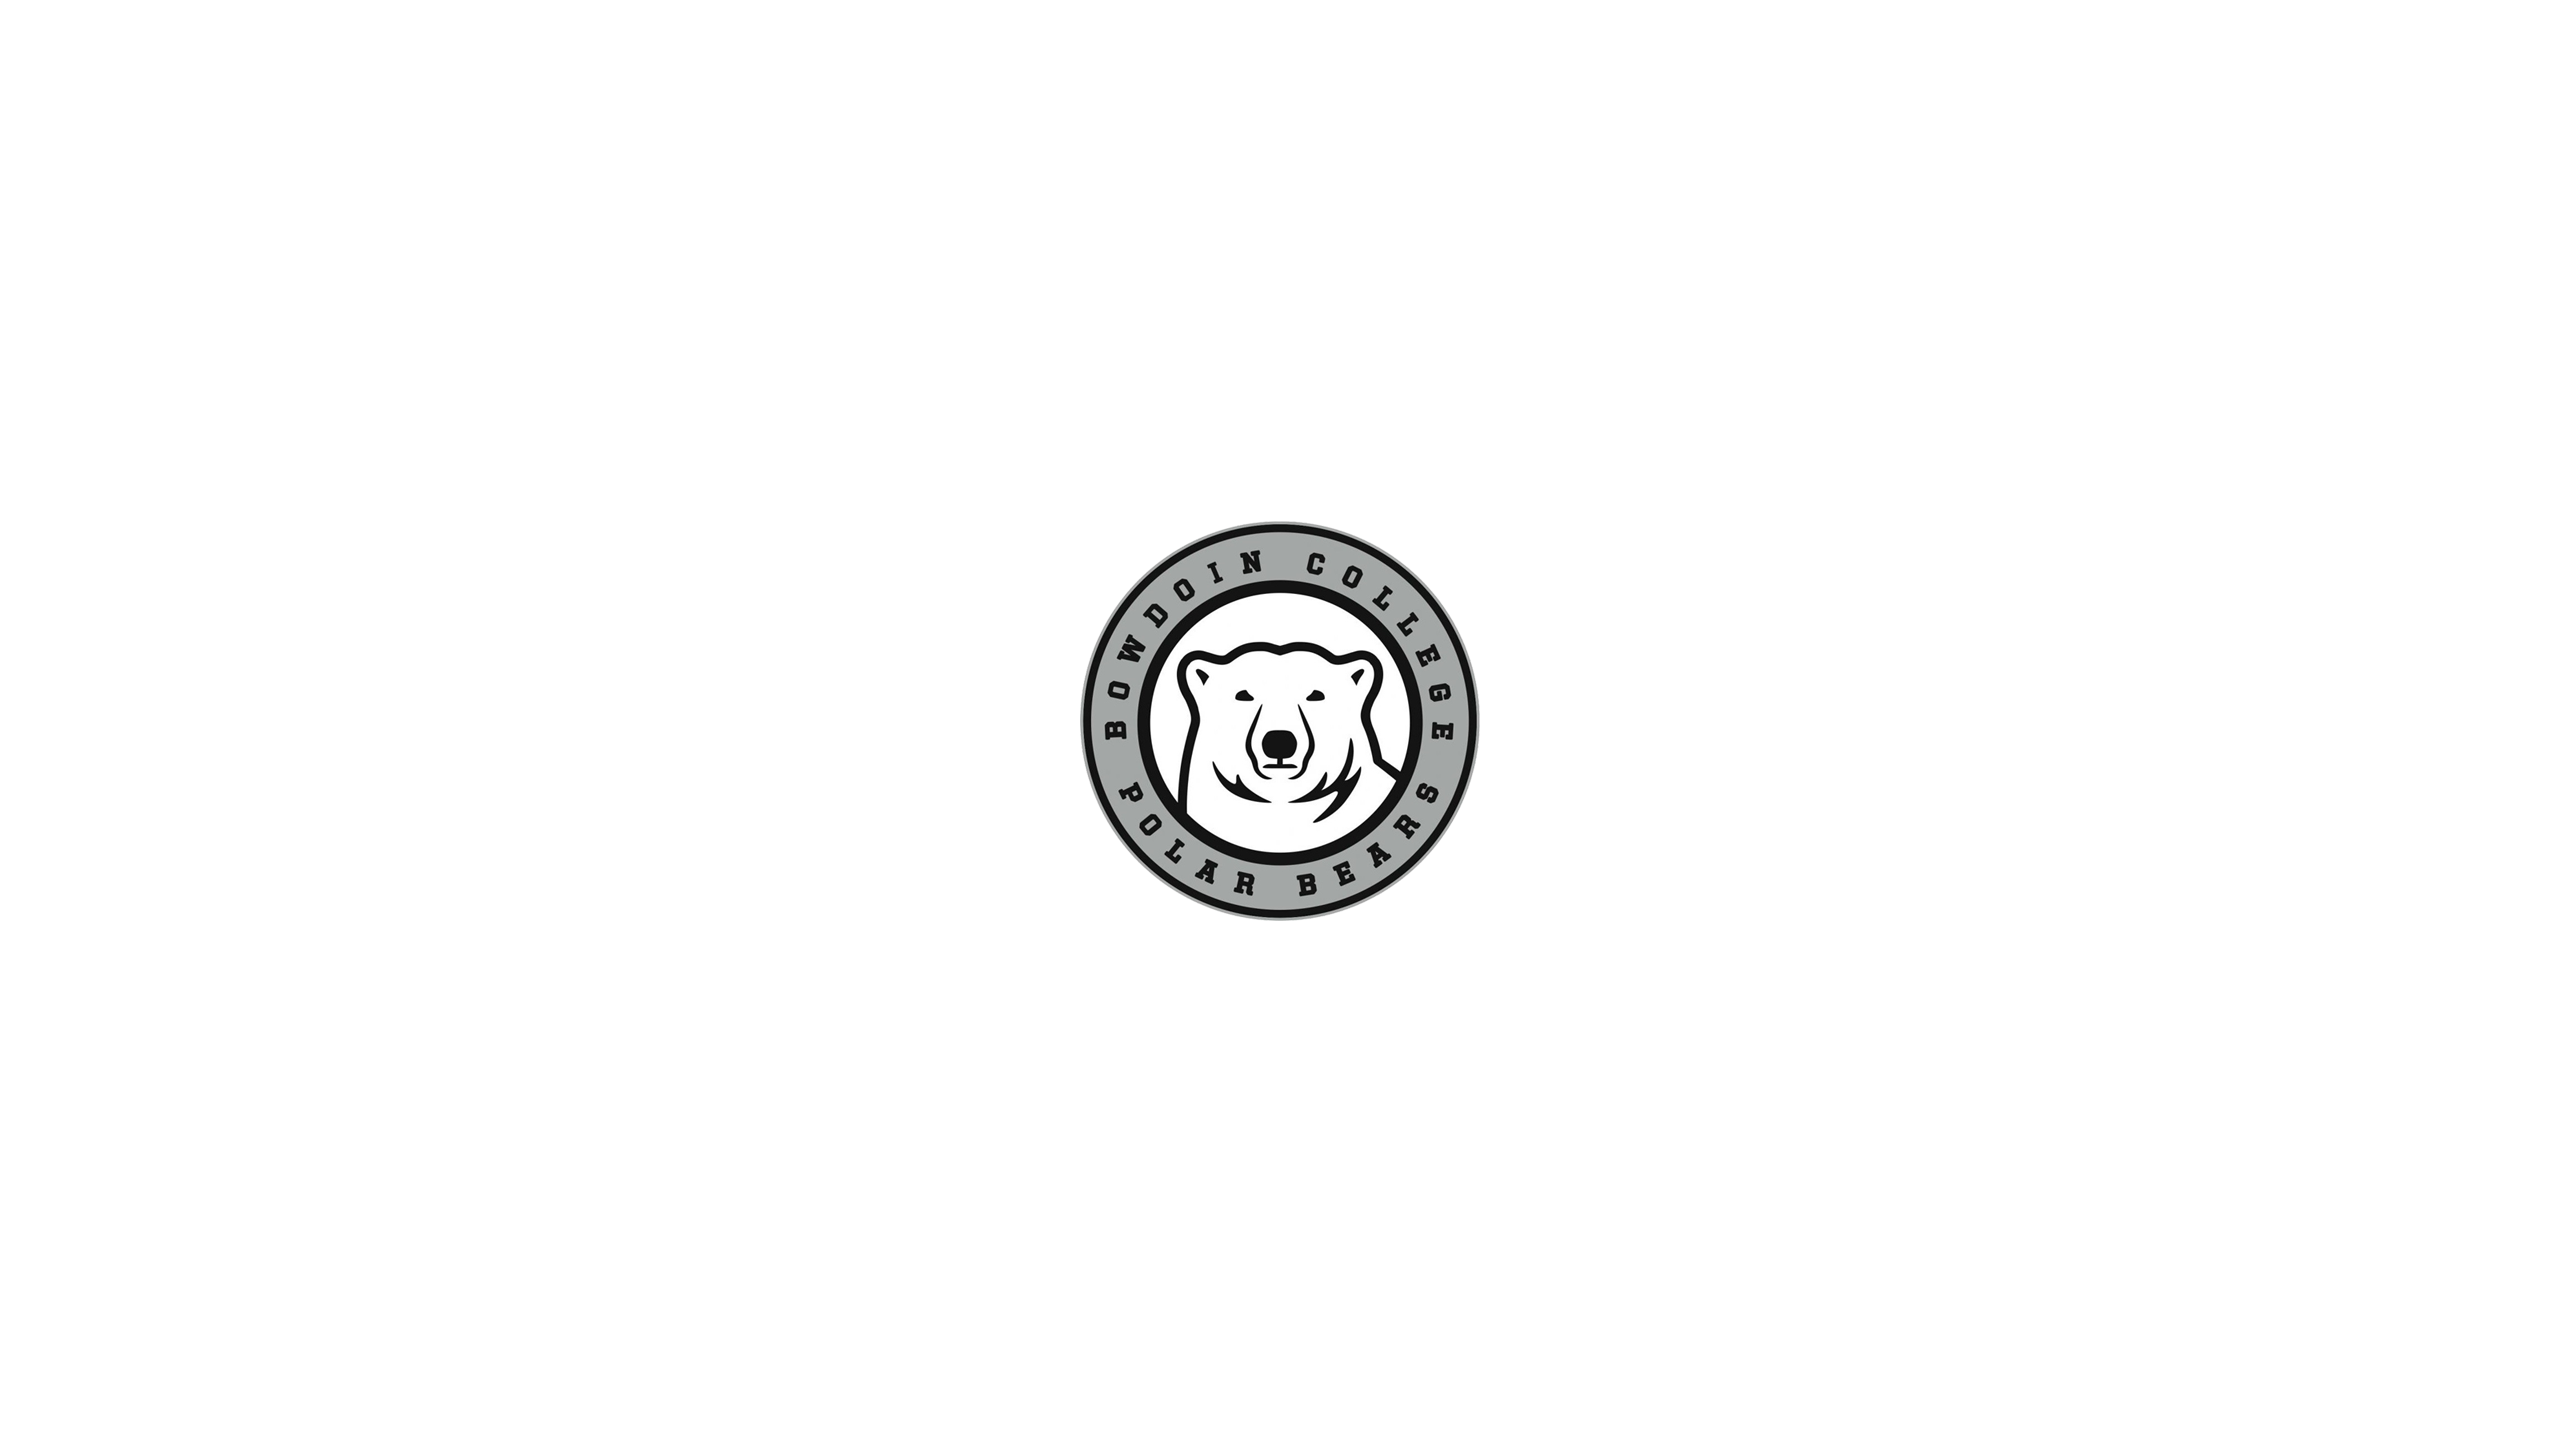 Bowdoin (ME) College Polar Bears